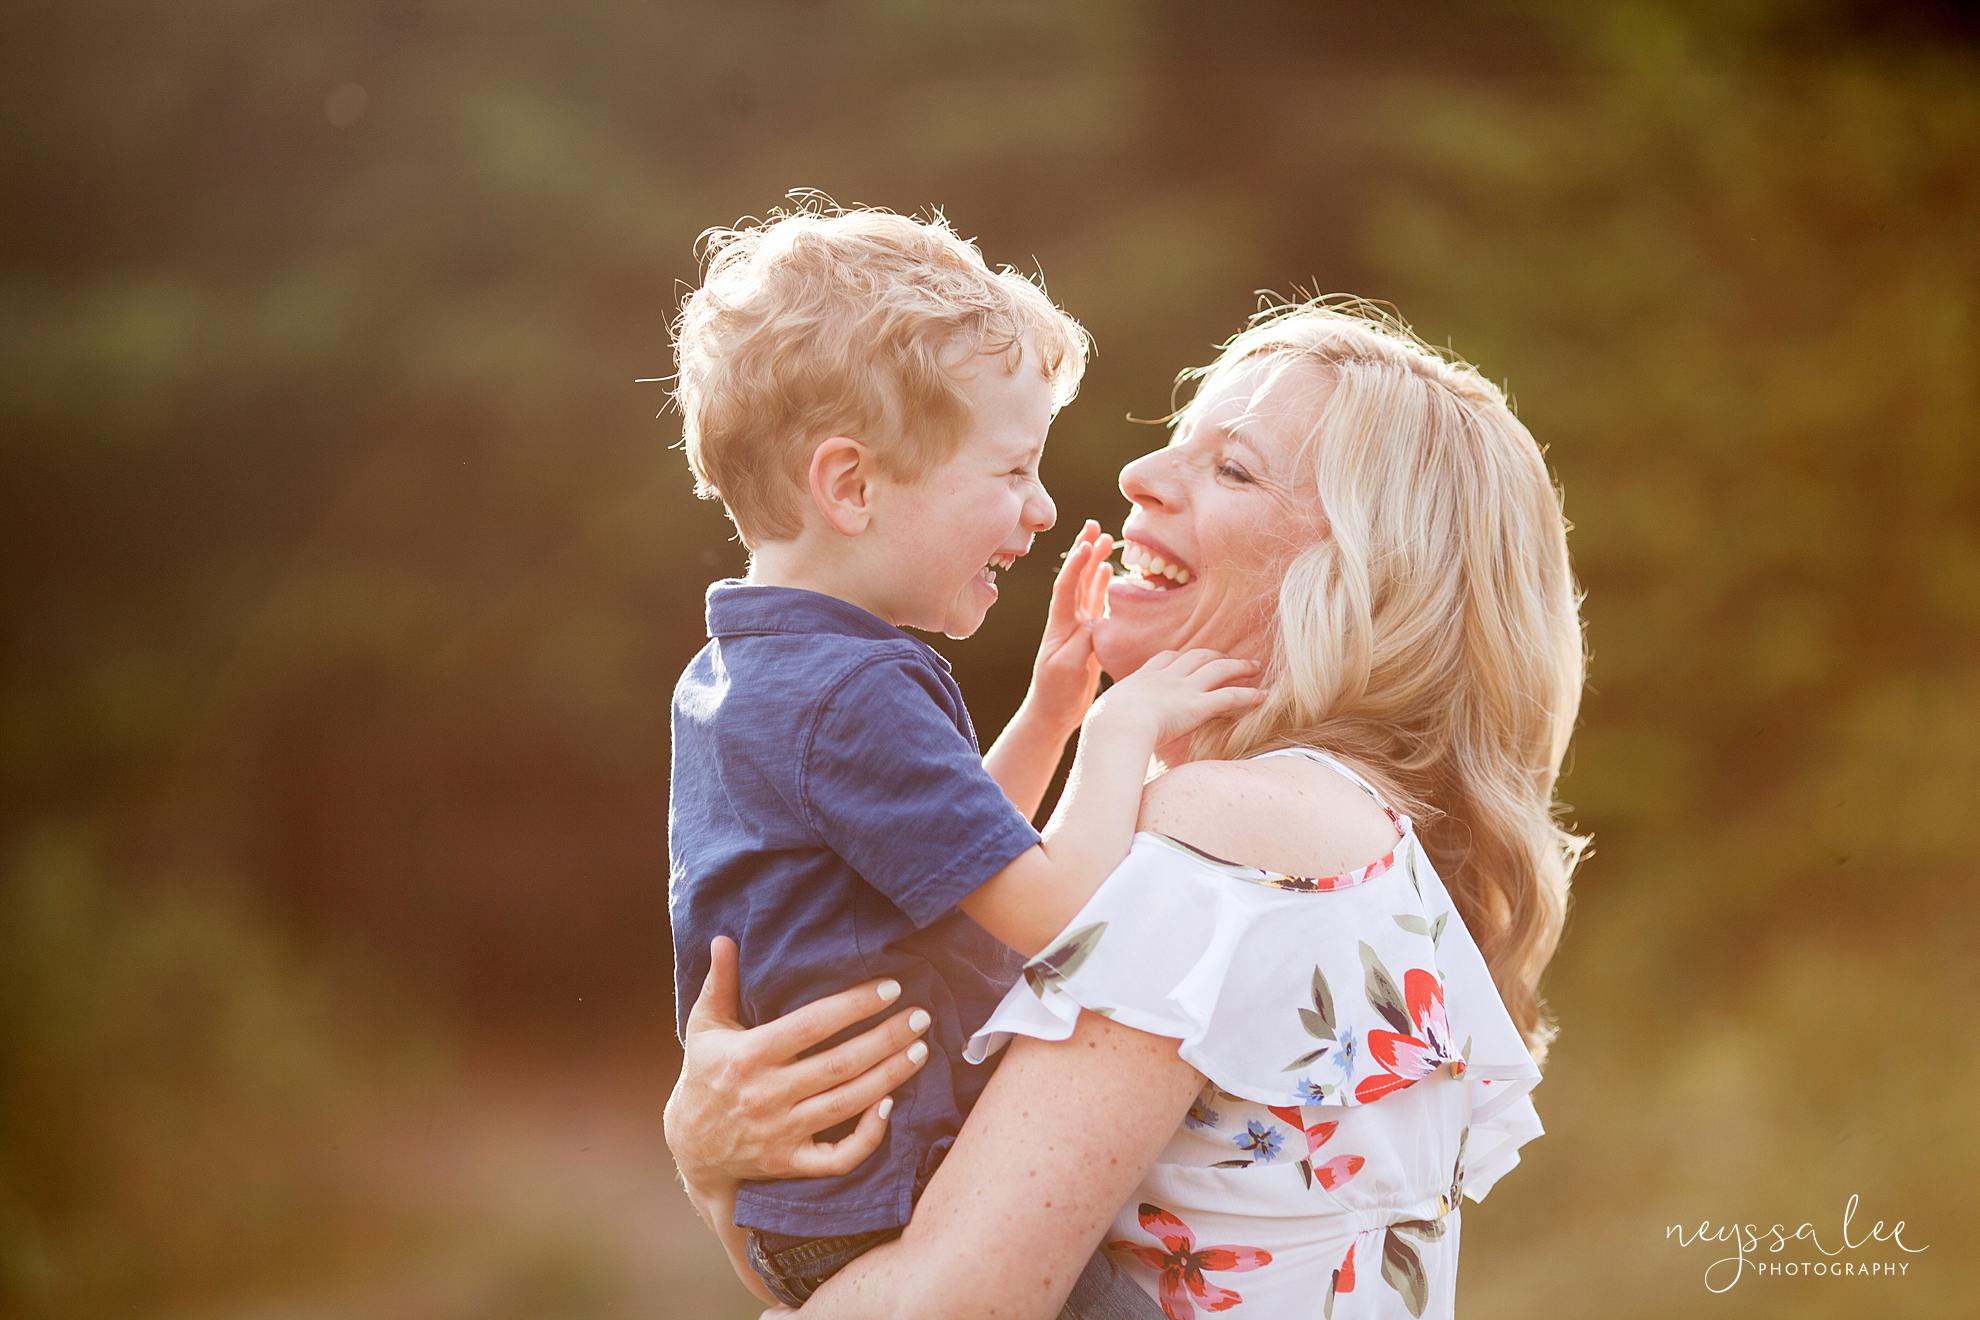 Neyssa Lee Photography, Seattle Maternity Photographer, Lifestyle photography